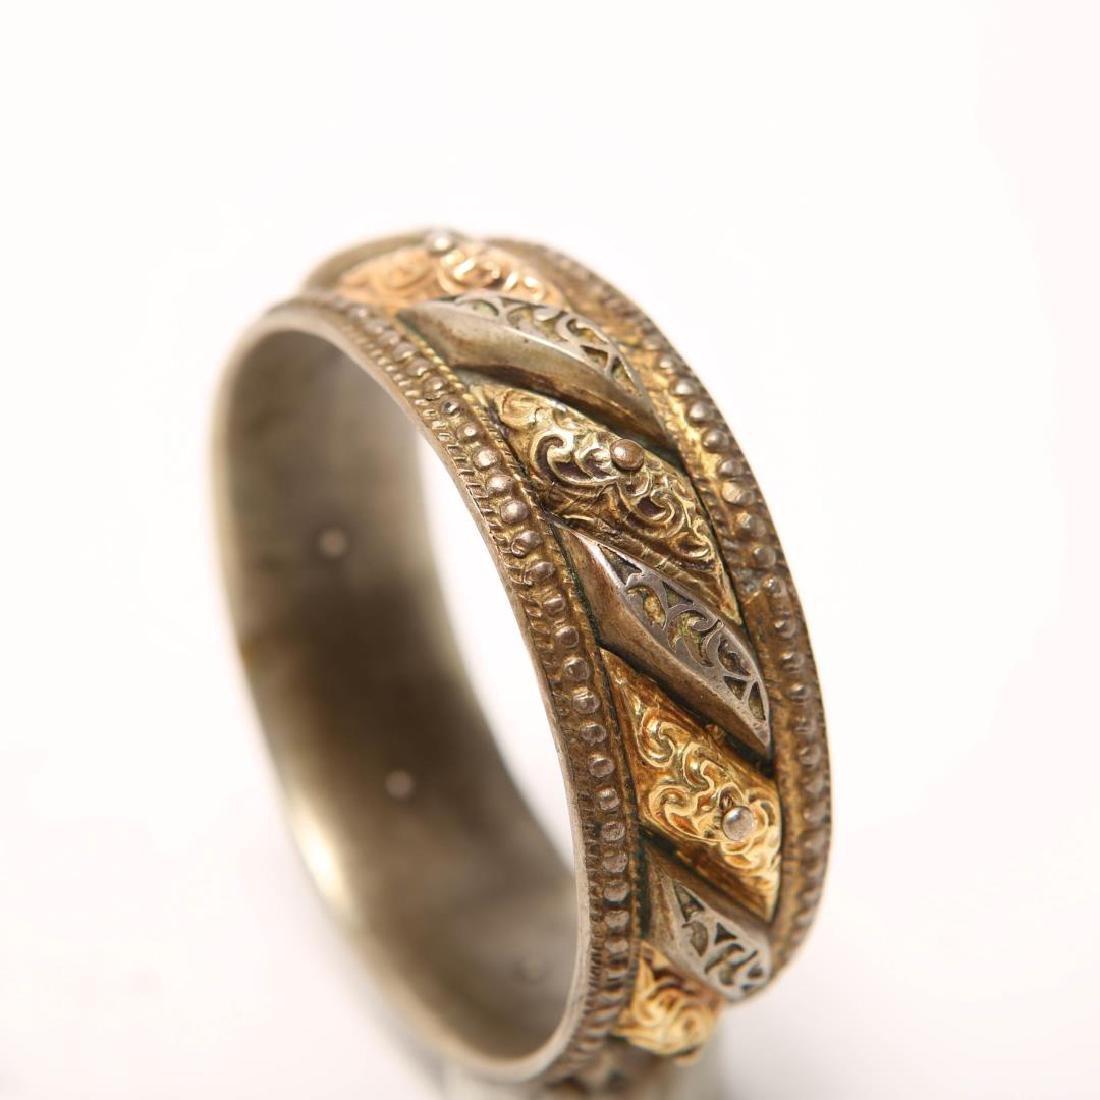 Renaissance-Revival Silver Bangle w. Applied Gold - 3